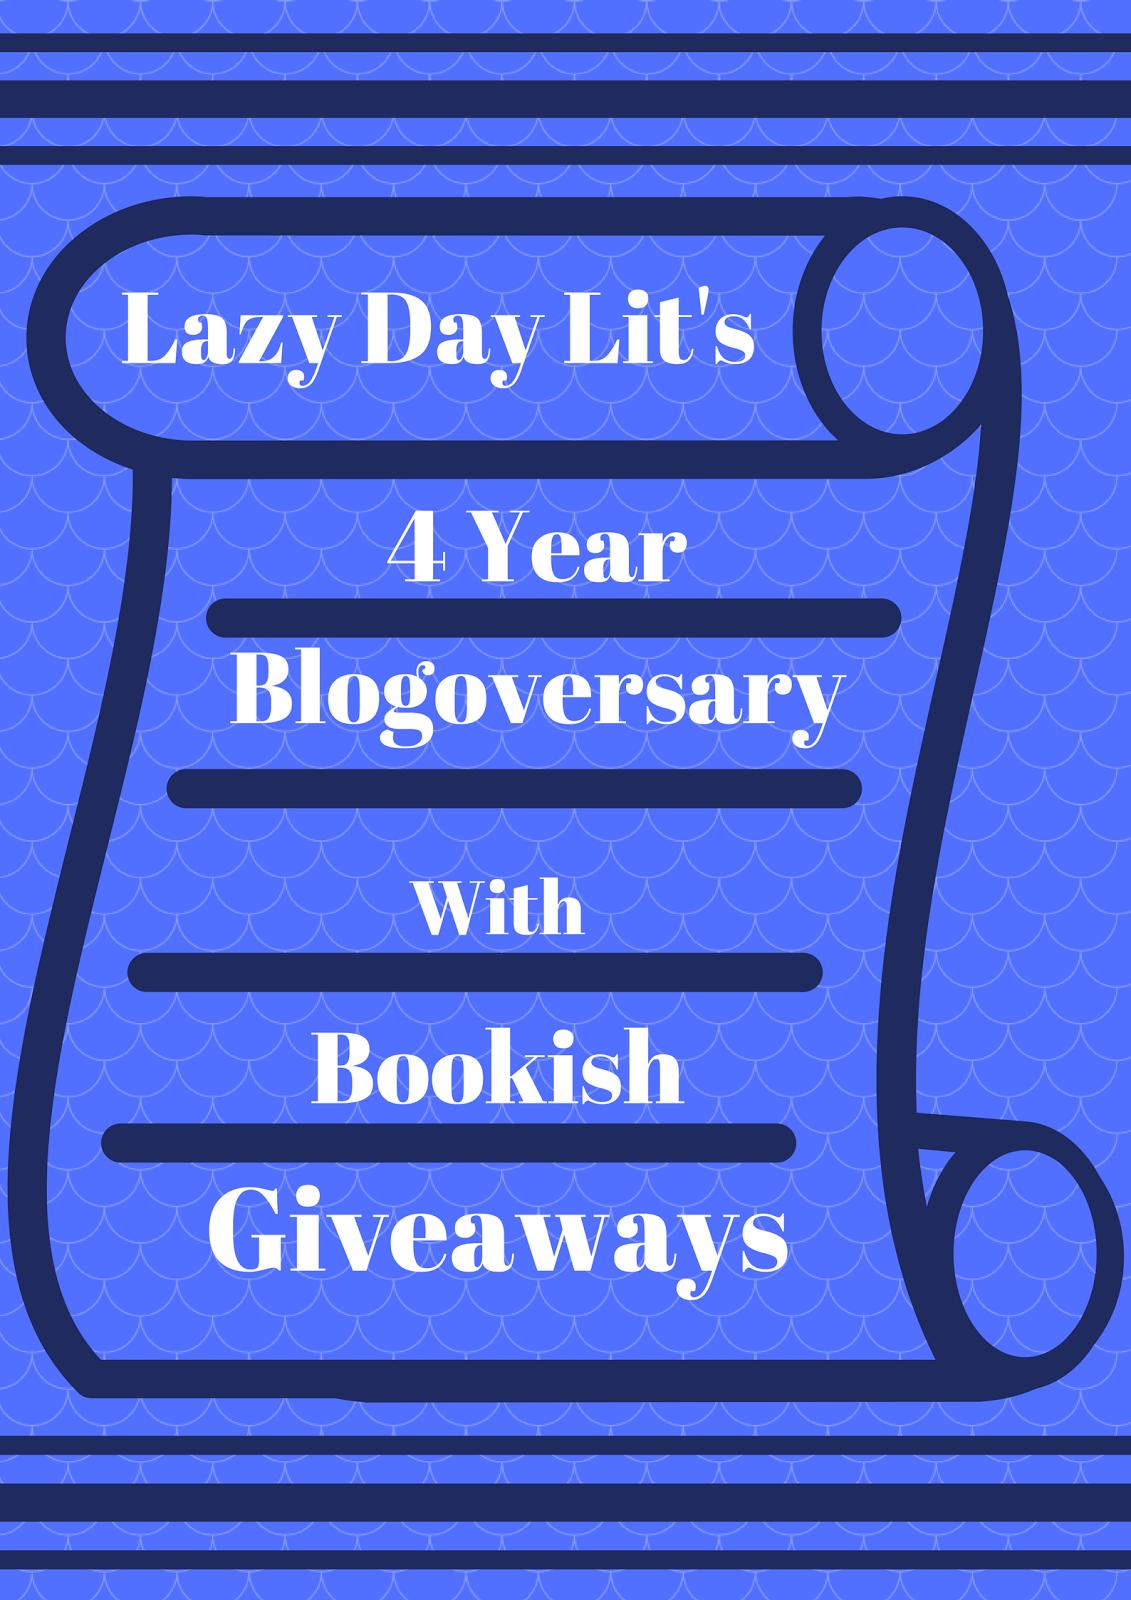 4 YR Blogoversary